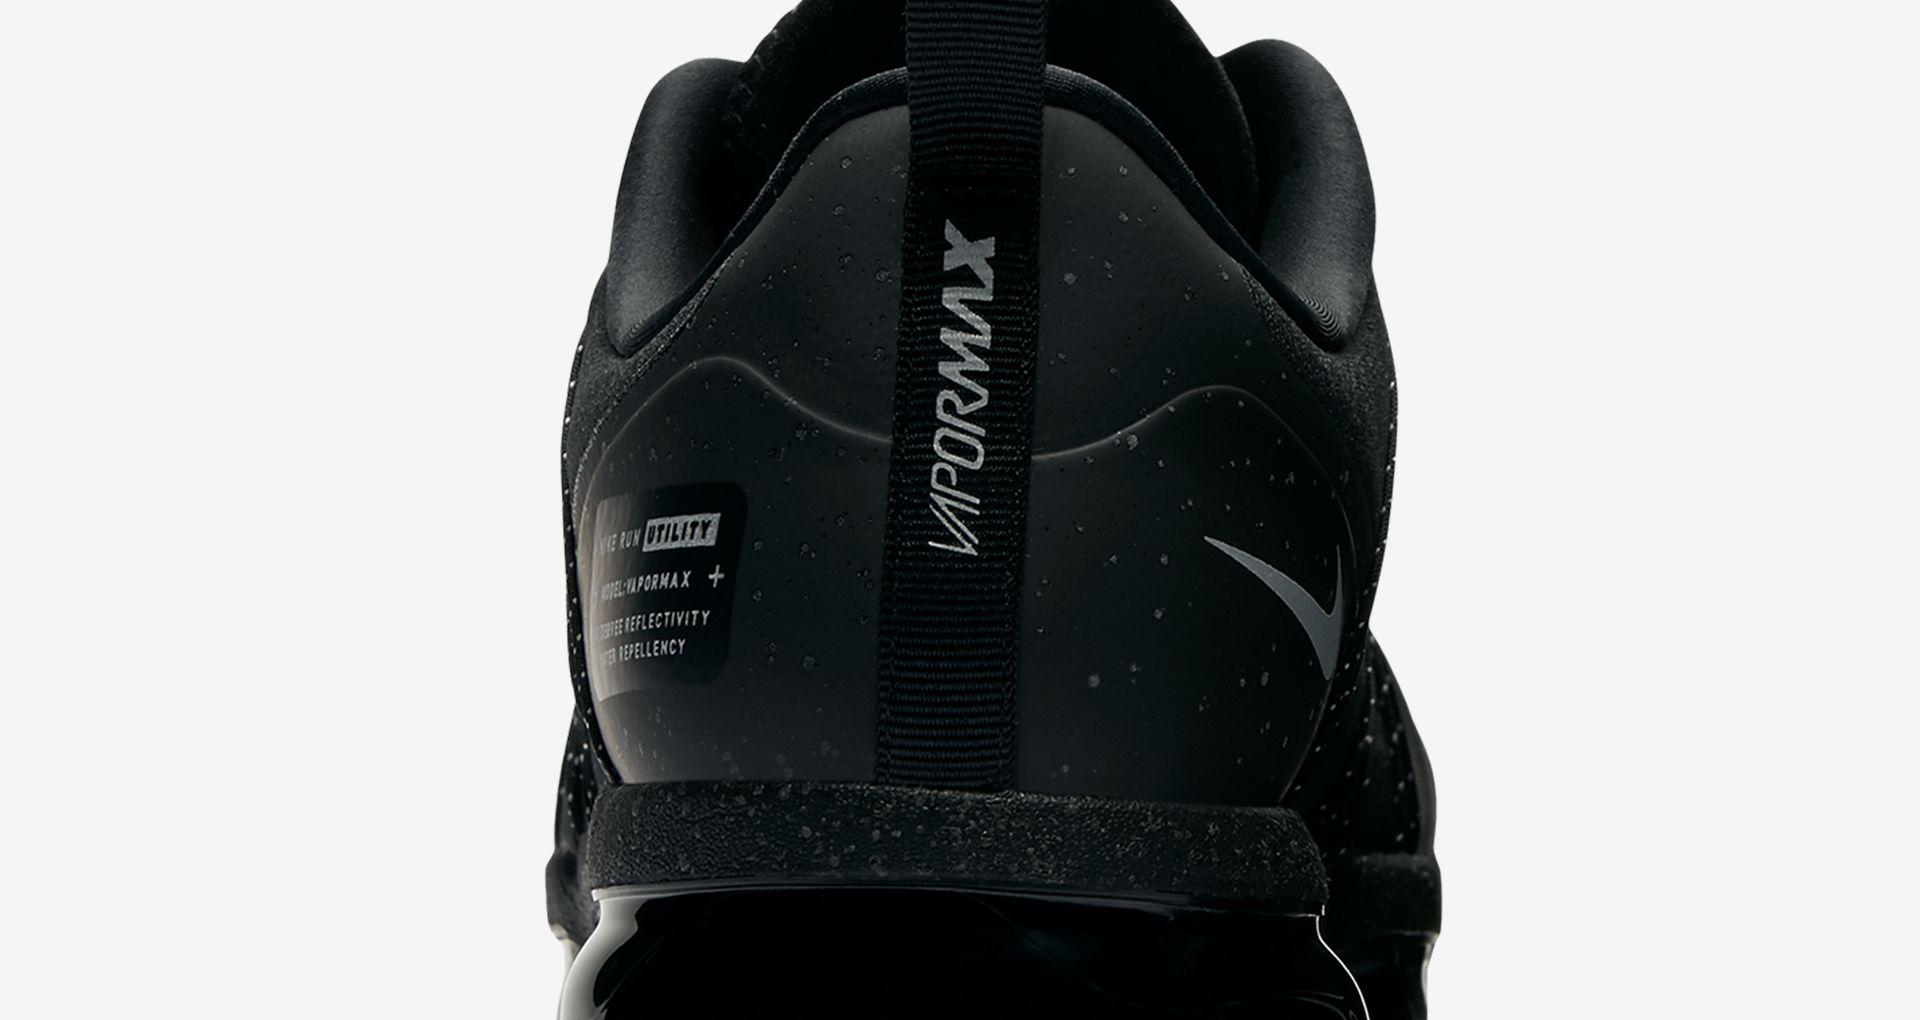 Nike Air Vapormax Run Utility Herren Schuhe Günstig Online